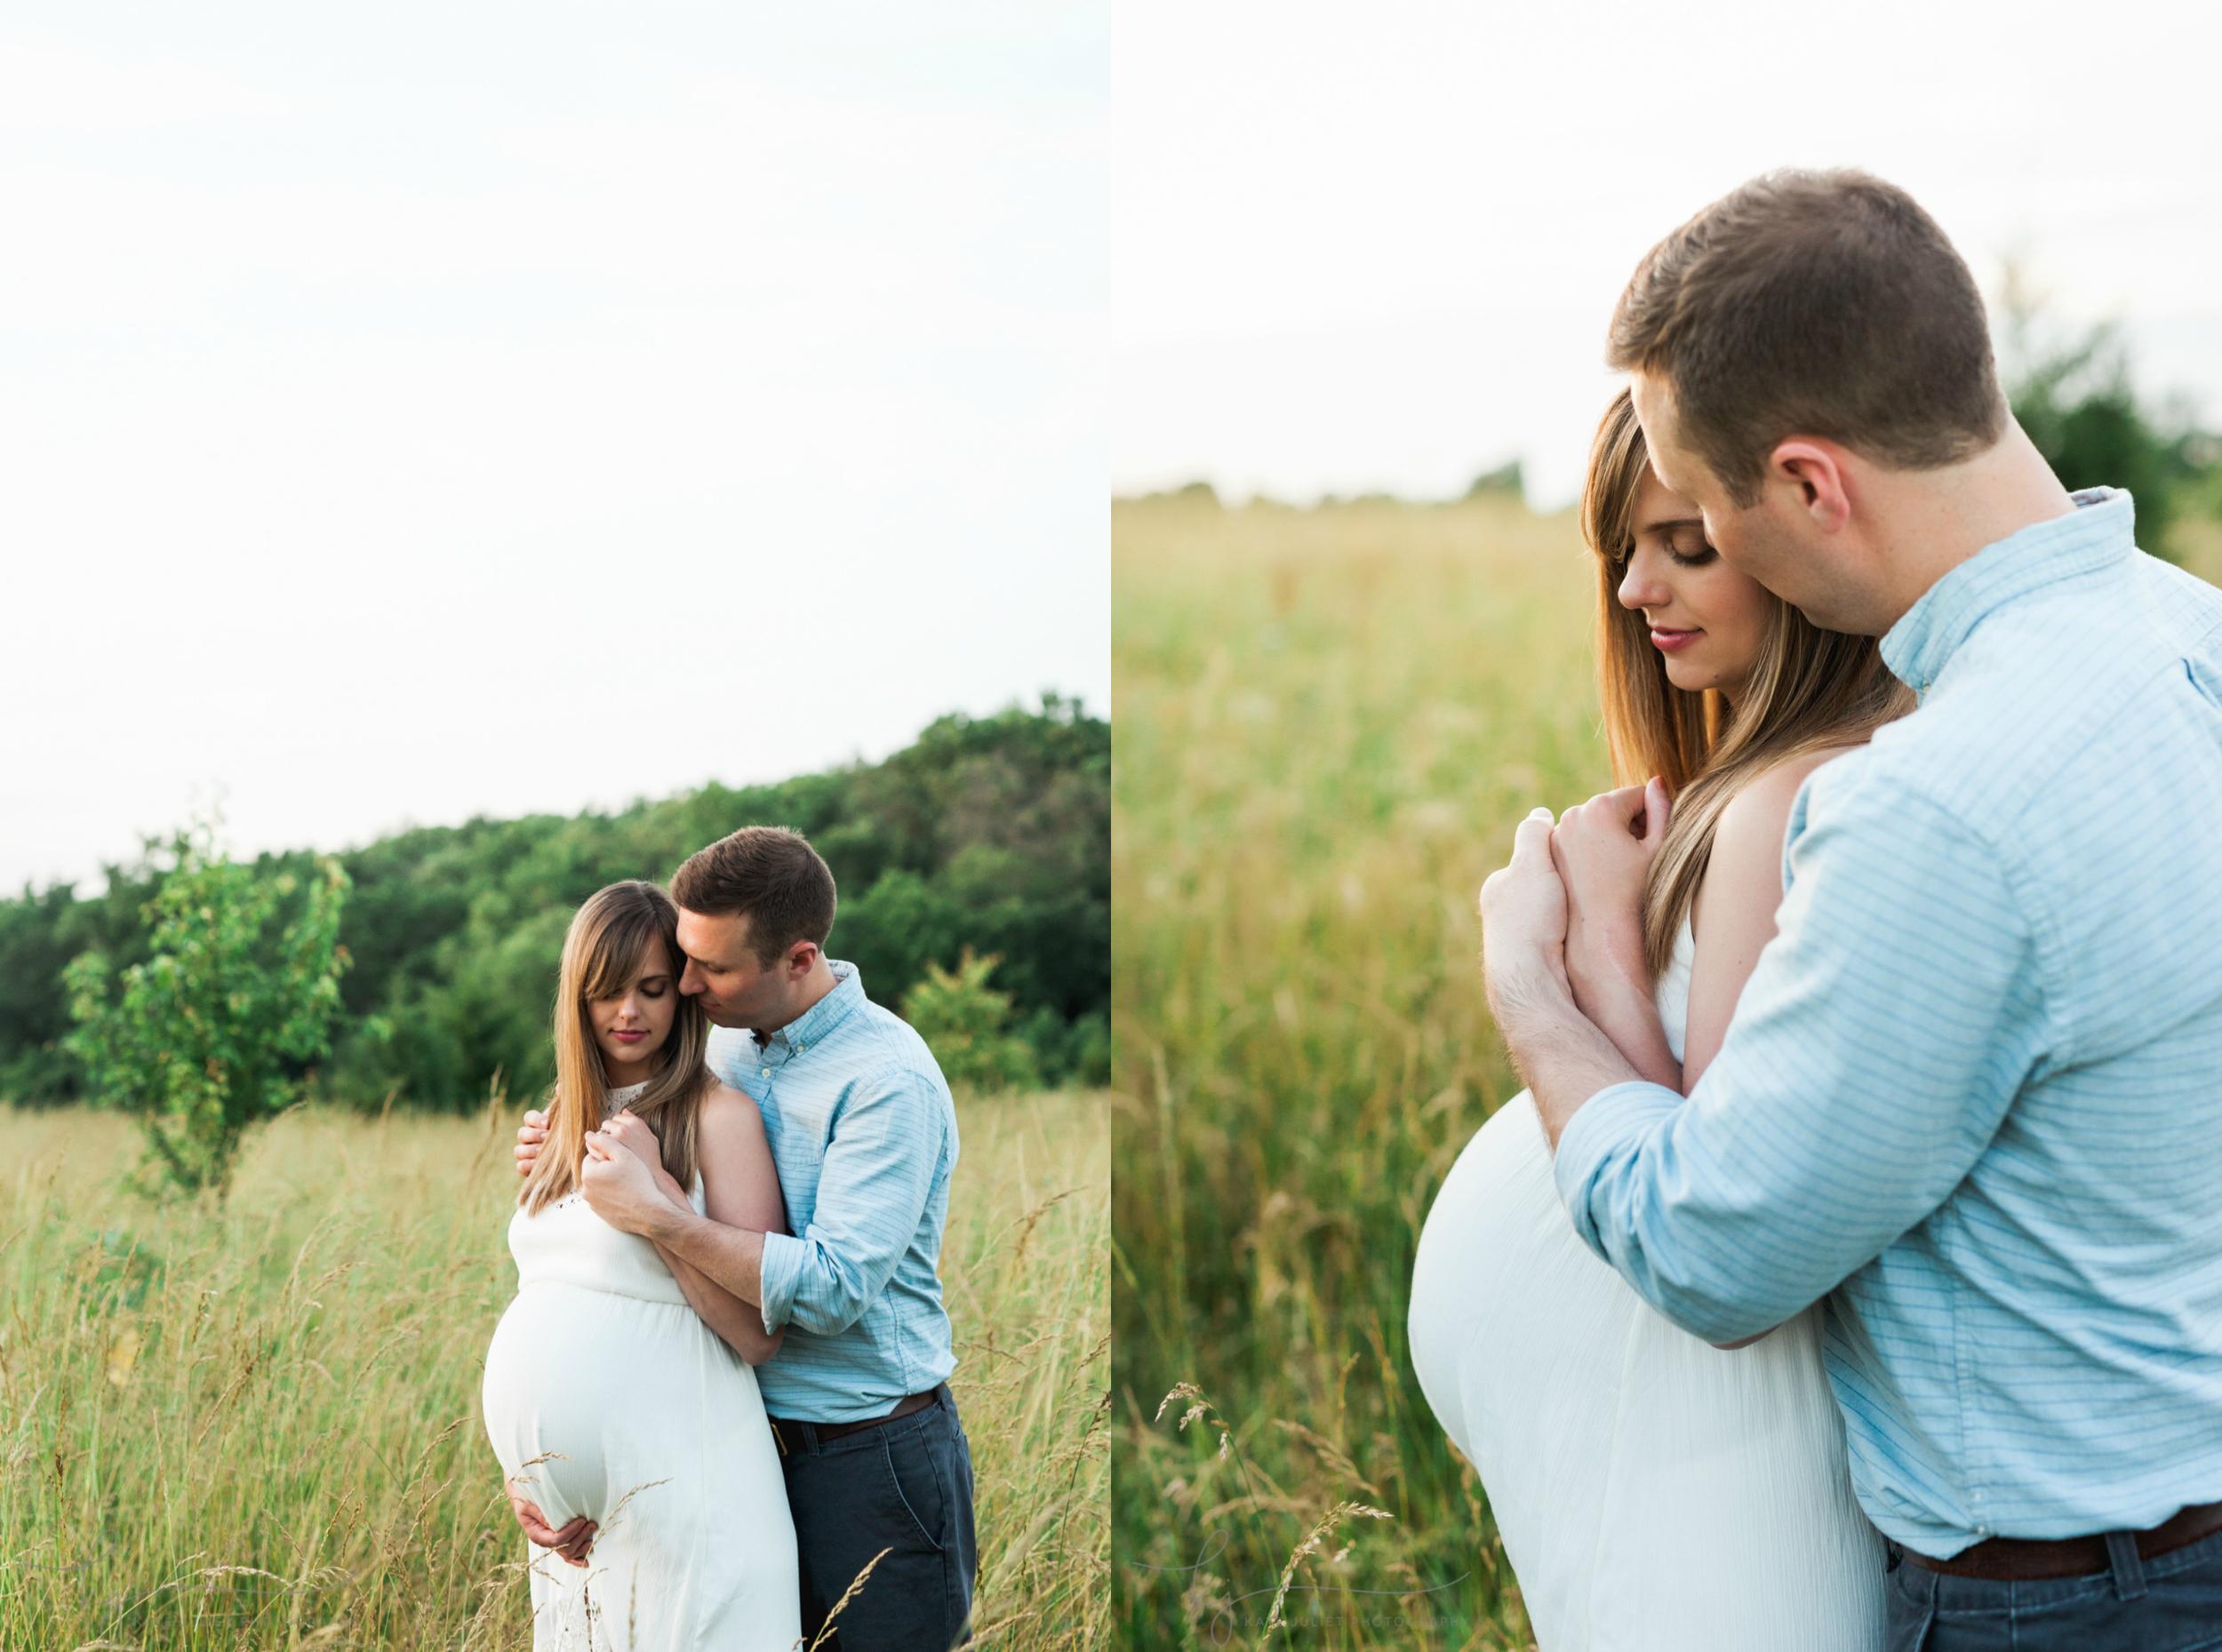 Washington DC Maternity and Newborn Photographer | Kate Juliet Photography